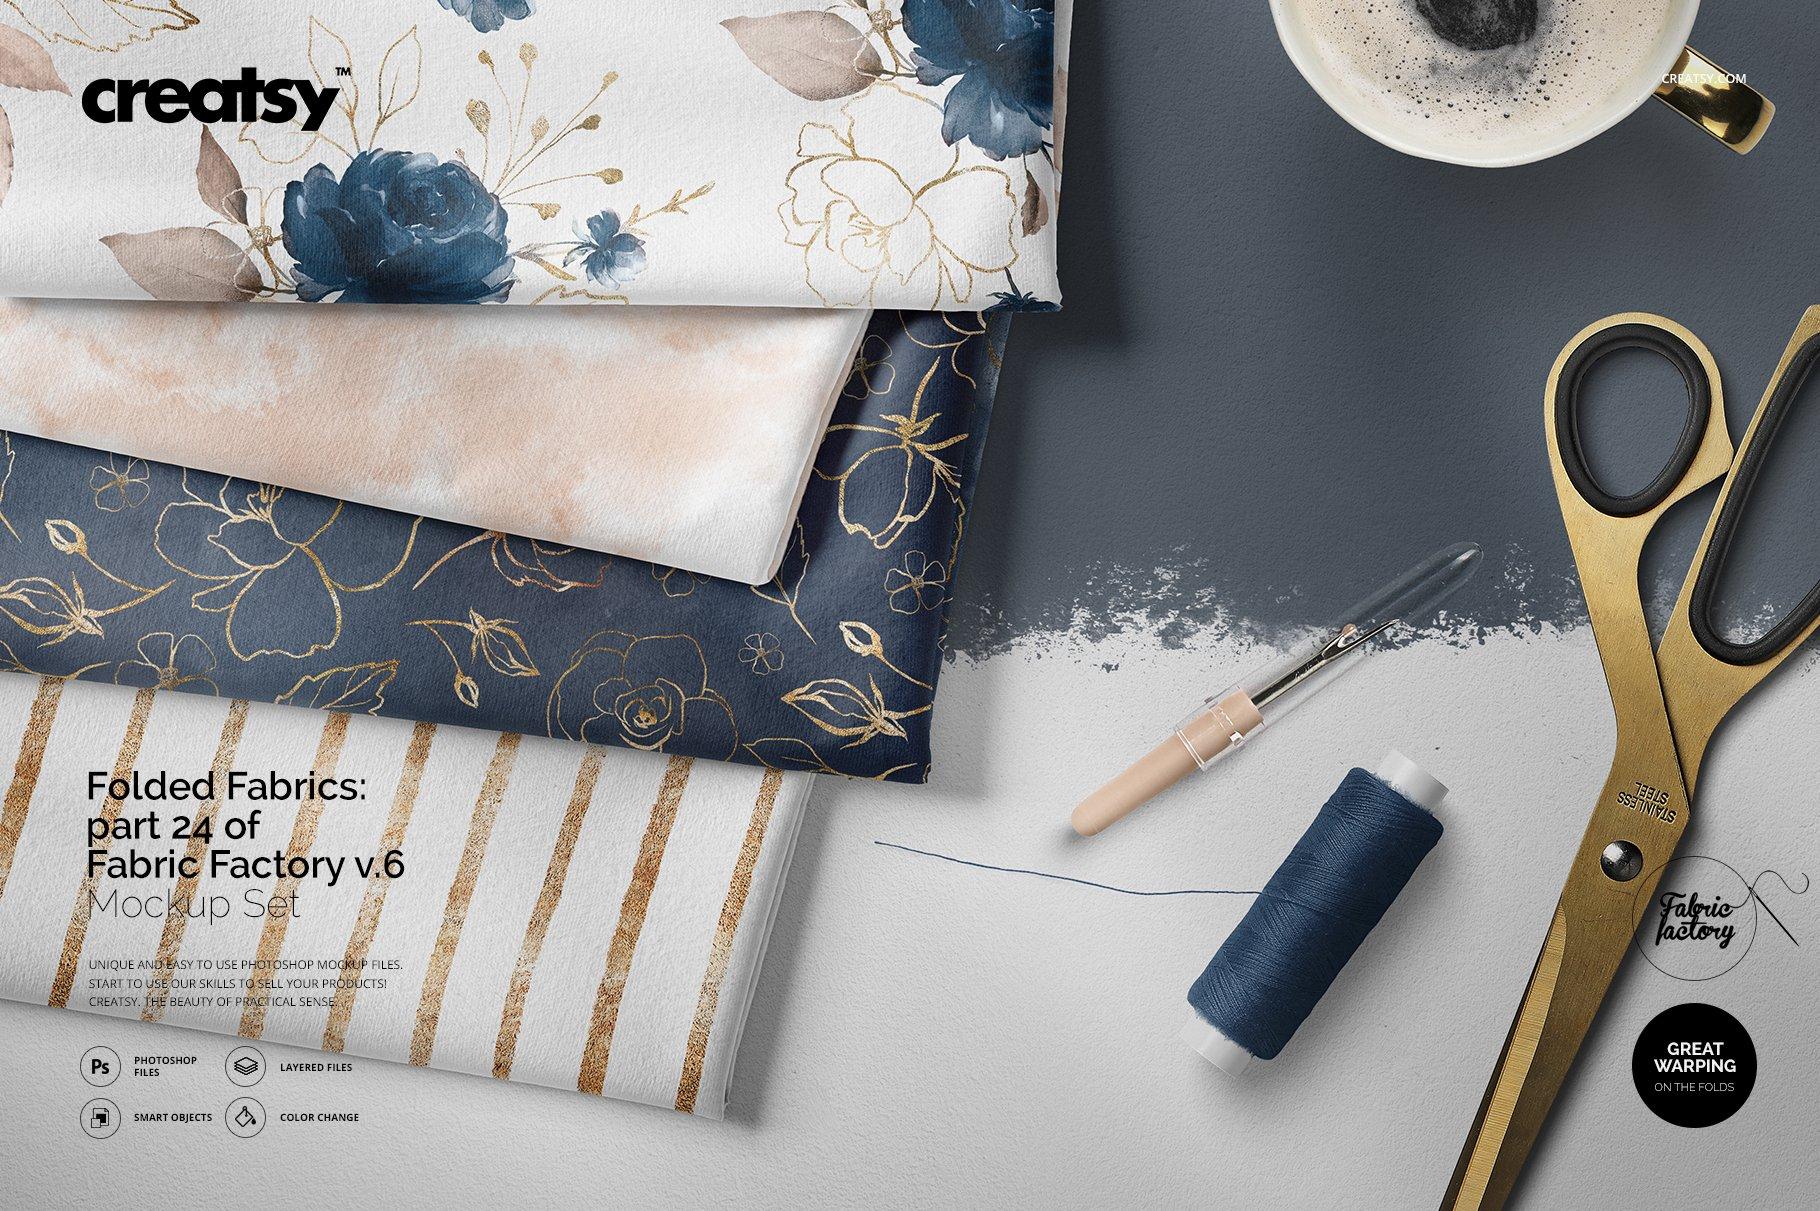 折叠织物面料印花图案设计贴图样机 Folded Fabrics Mockup 24/FF v.6插图